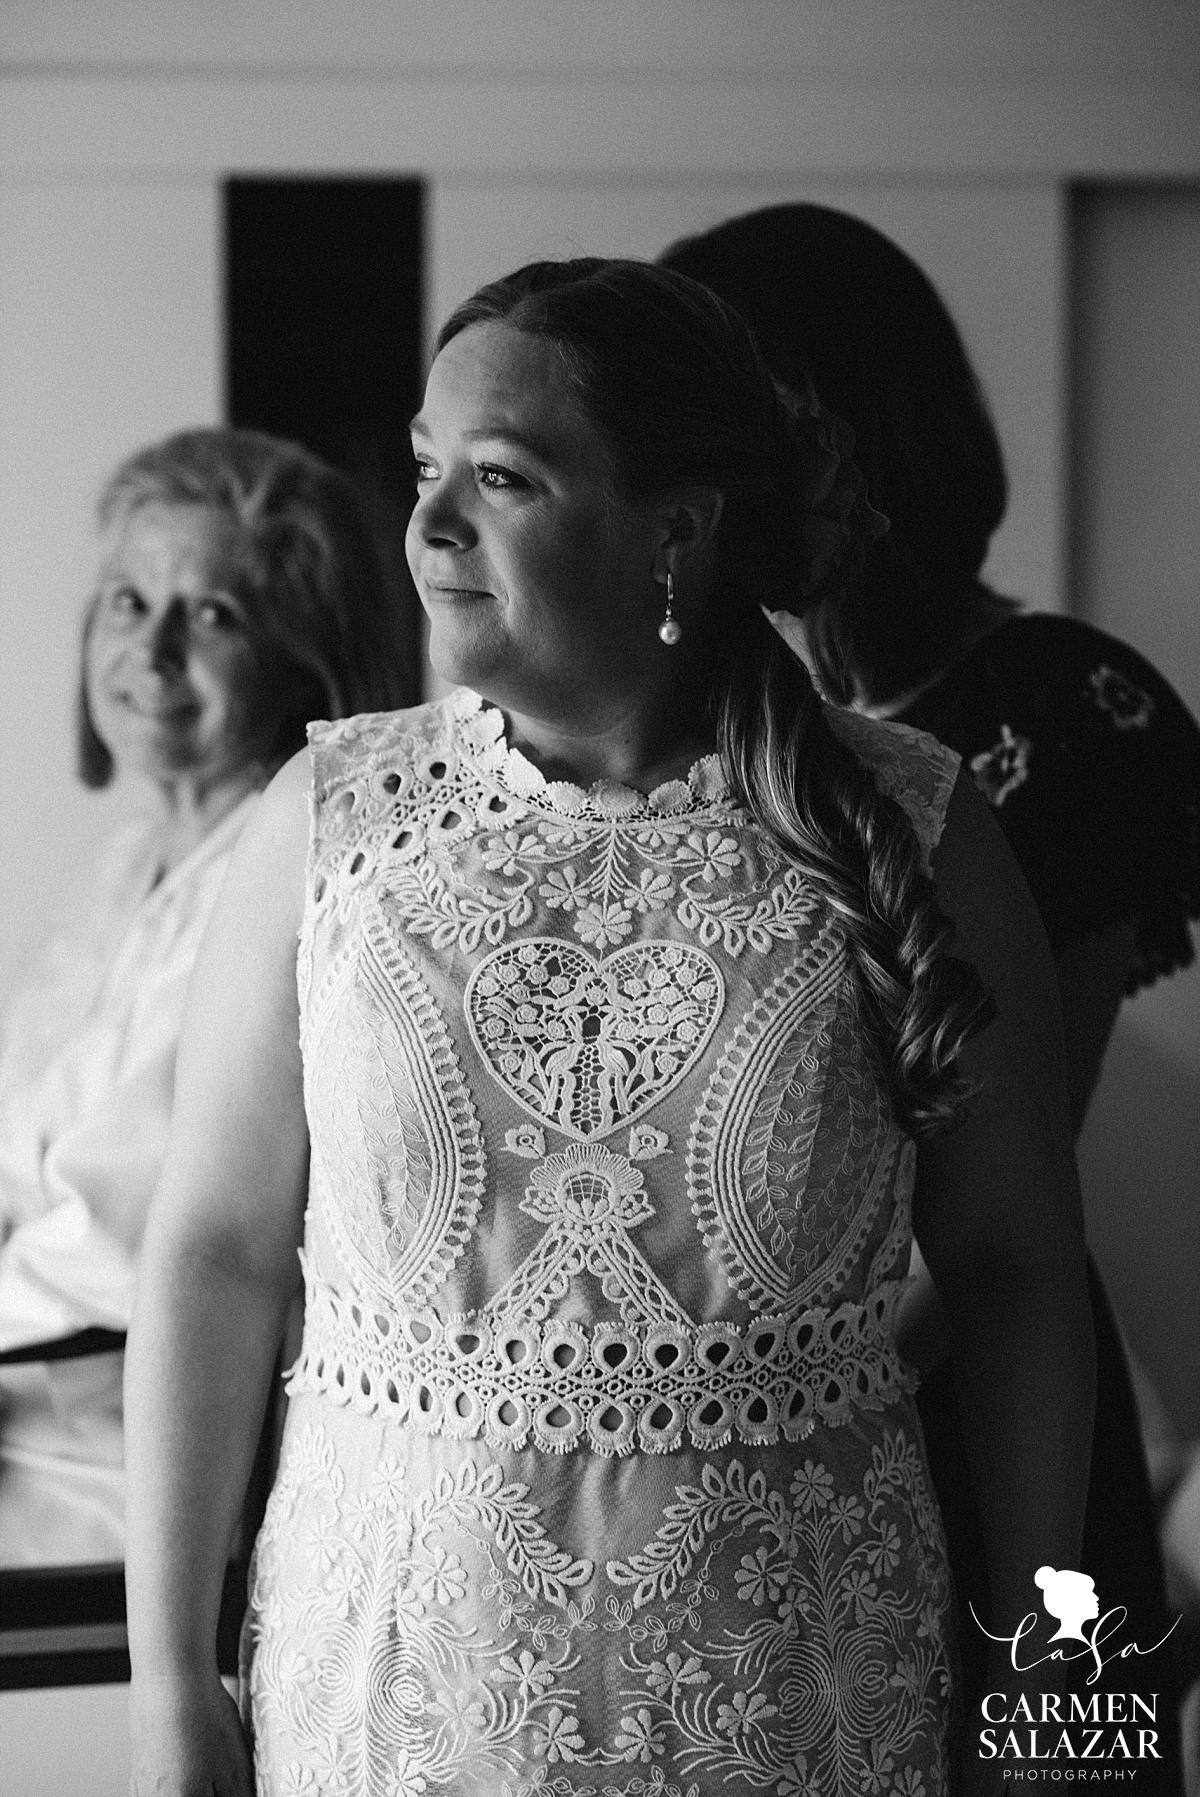 Bride wearing Anthropologie wedding dress - Carmen Salazar